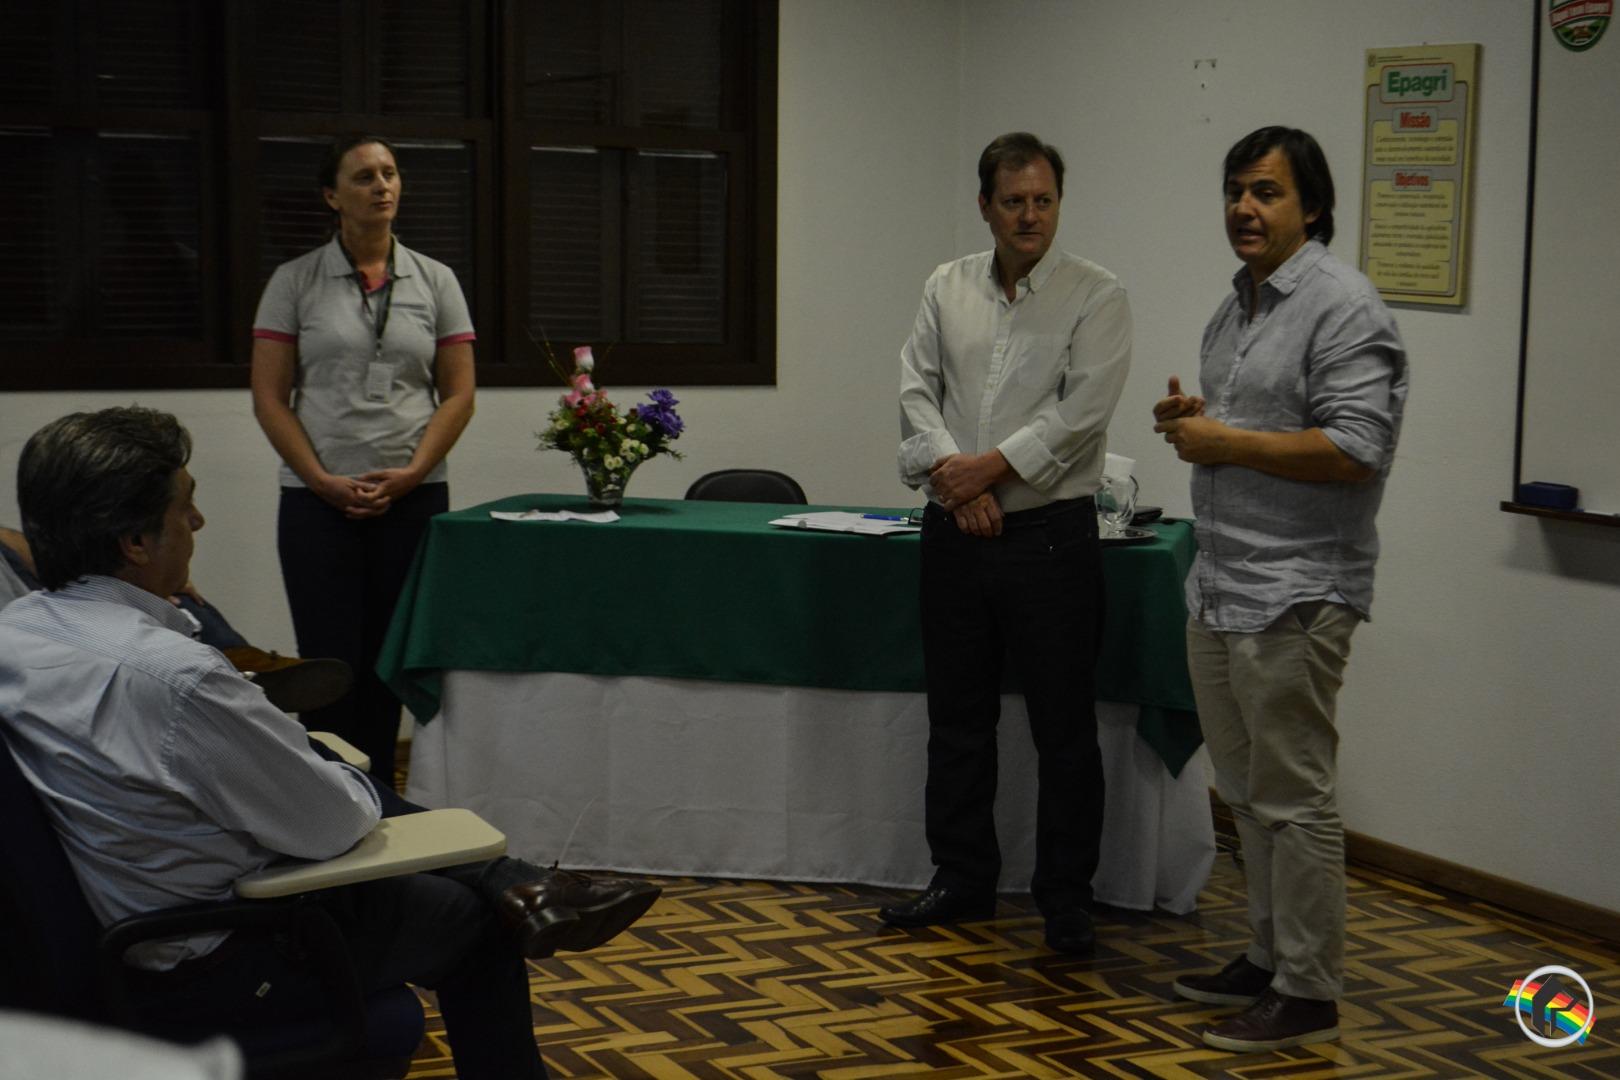 Lideranças participam de Encontro Internacional no Cetresmo